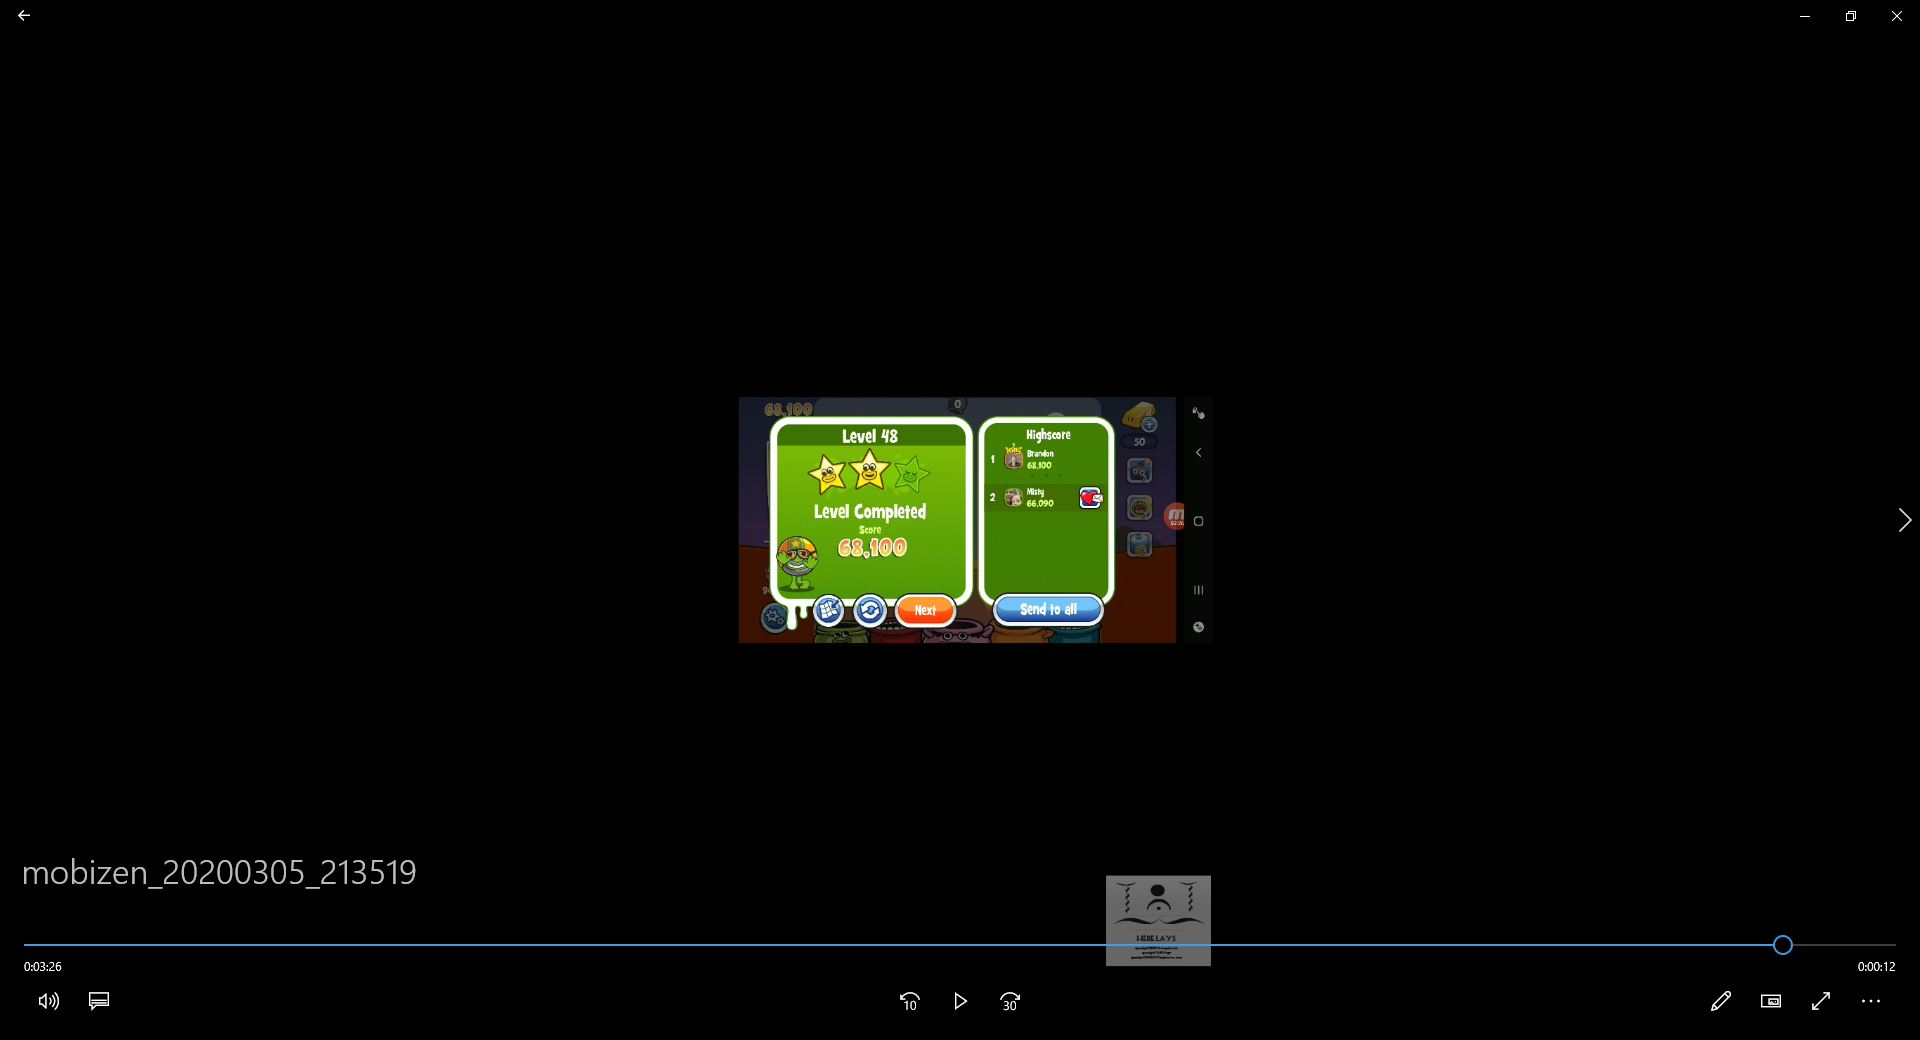 speedy4759123: Papa Pear Saga: Level 048 (Android) 68,100 points on 2020-03-29 07:52:49